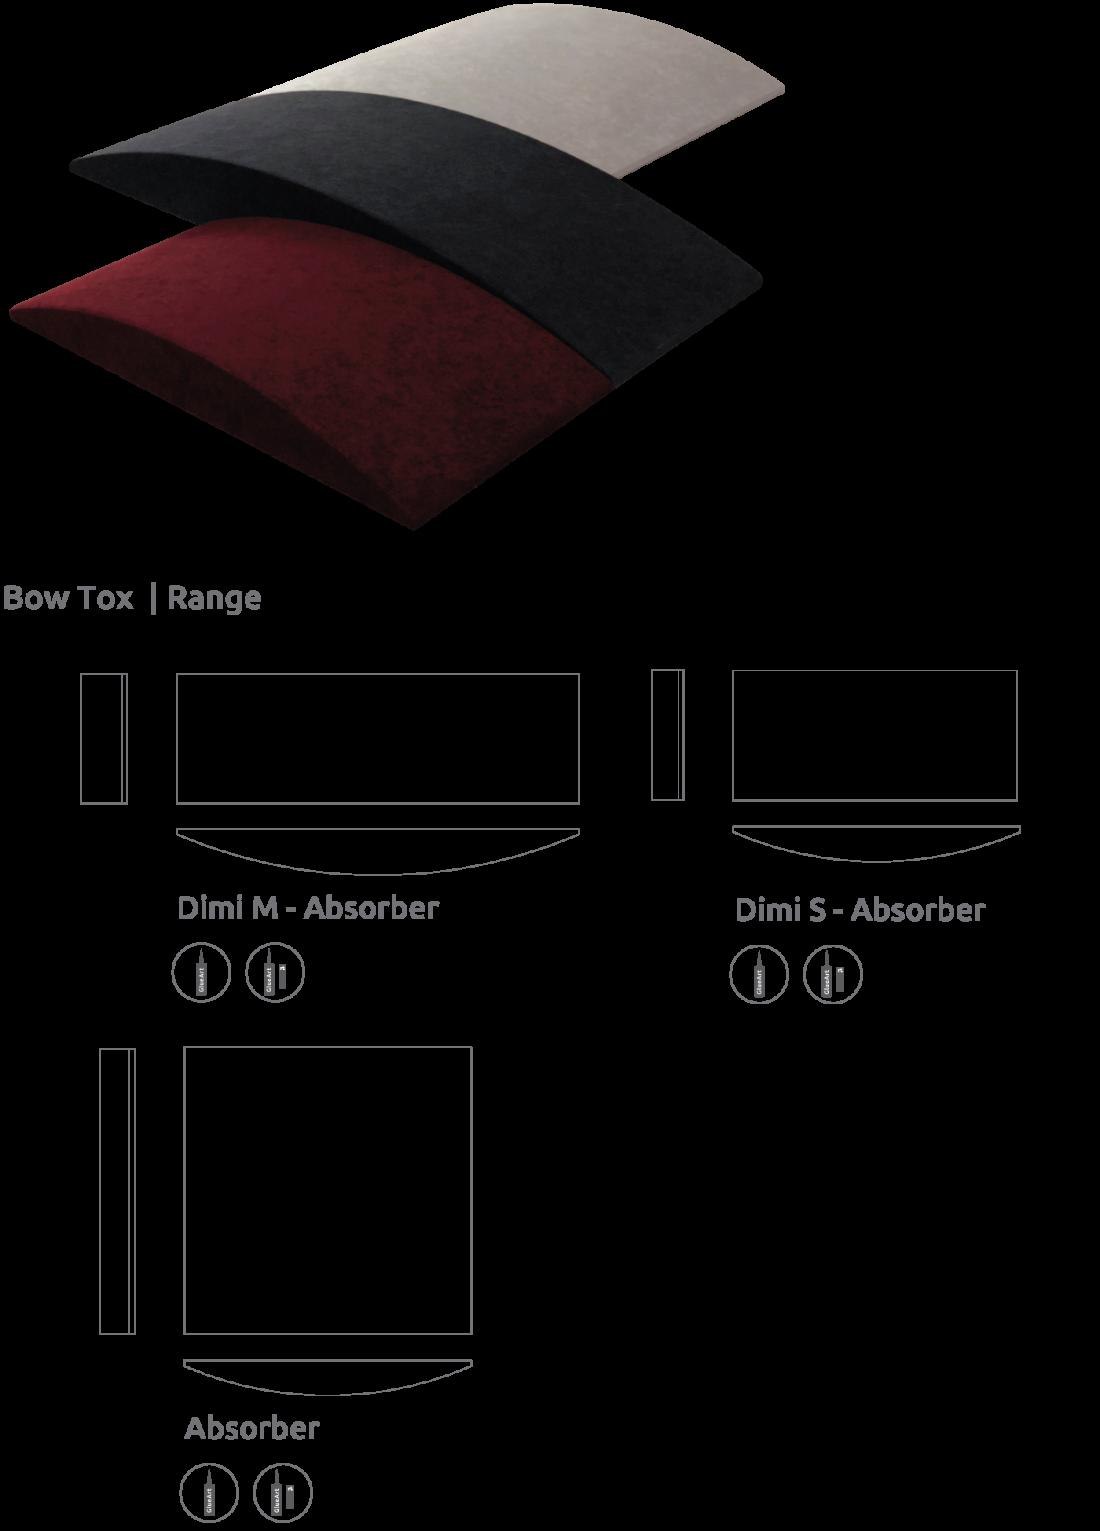 Artnovion product bow tox absorber range d12c42175f